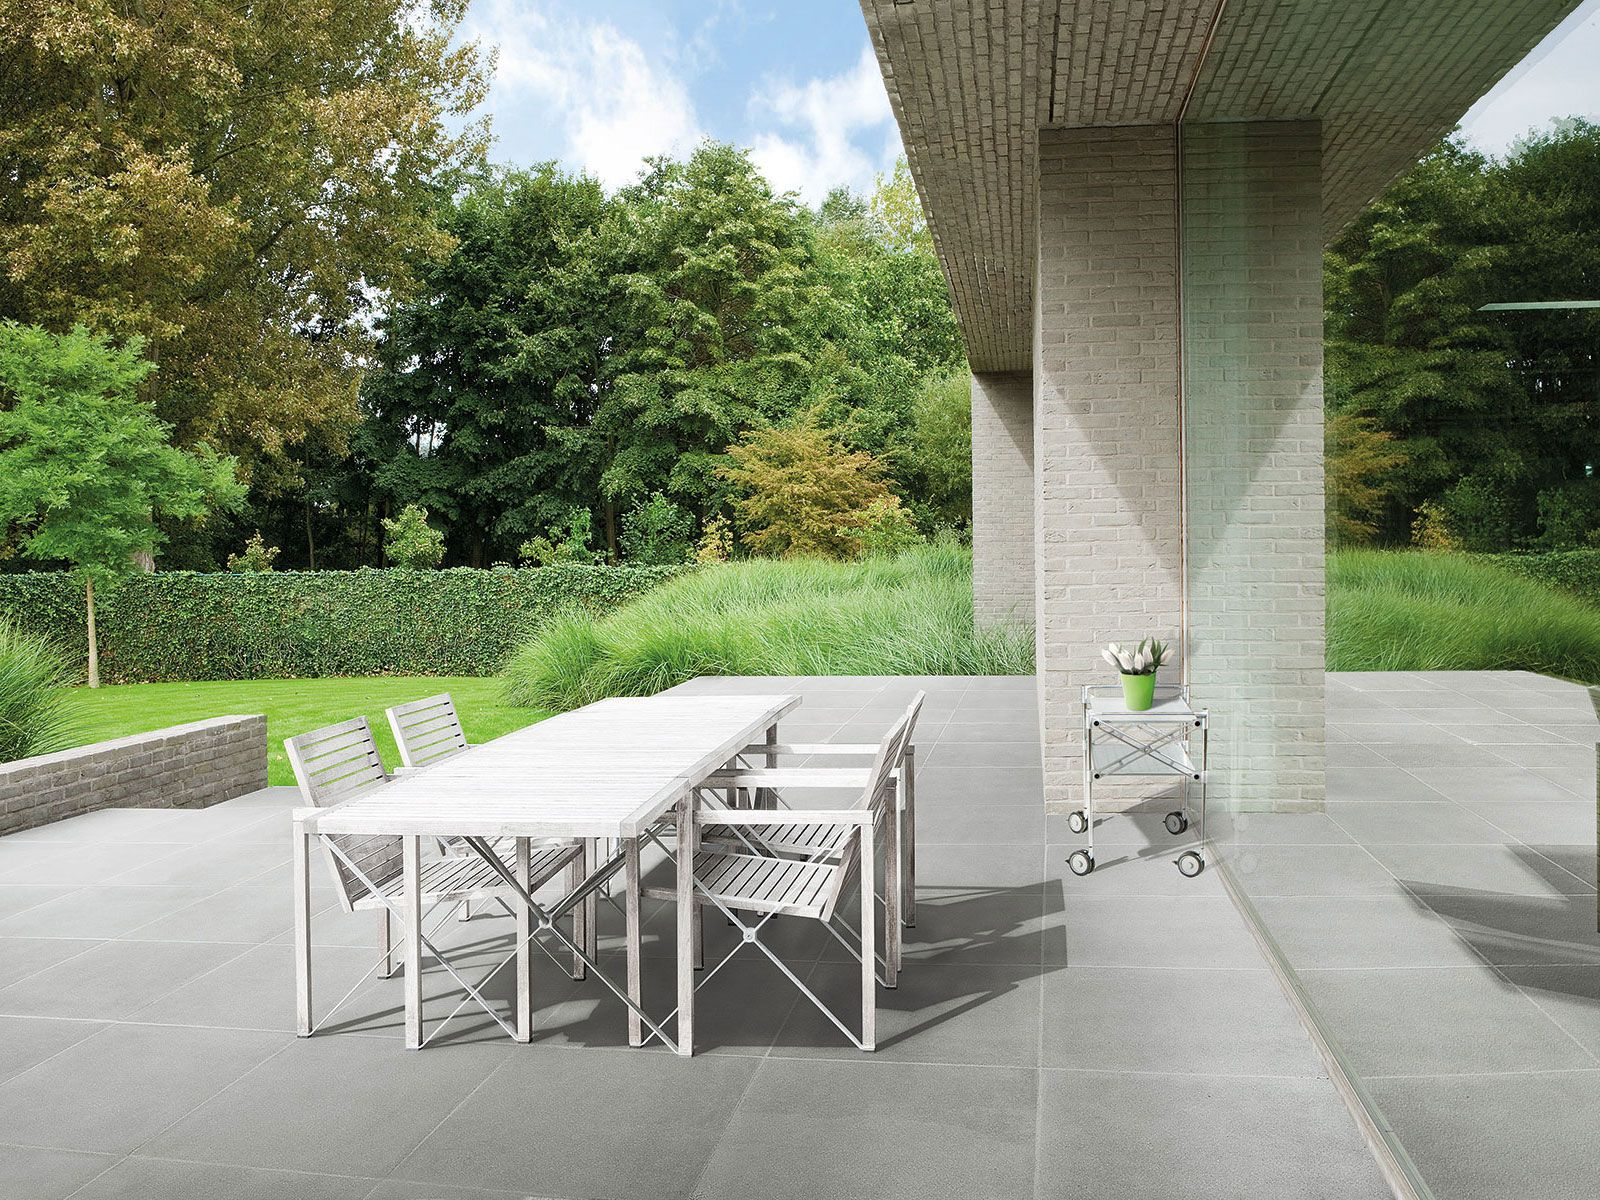 terrassenplatten reinigen beton 1000 ideas about terrassenplatten naturstein on pinterest. Black Bedroom Furniture Sets. Home Design Ideas